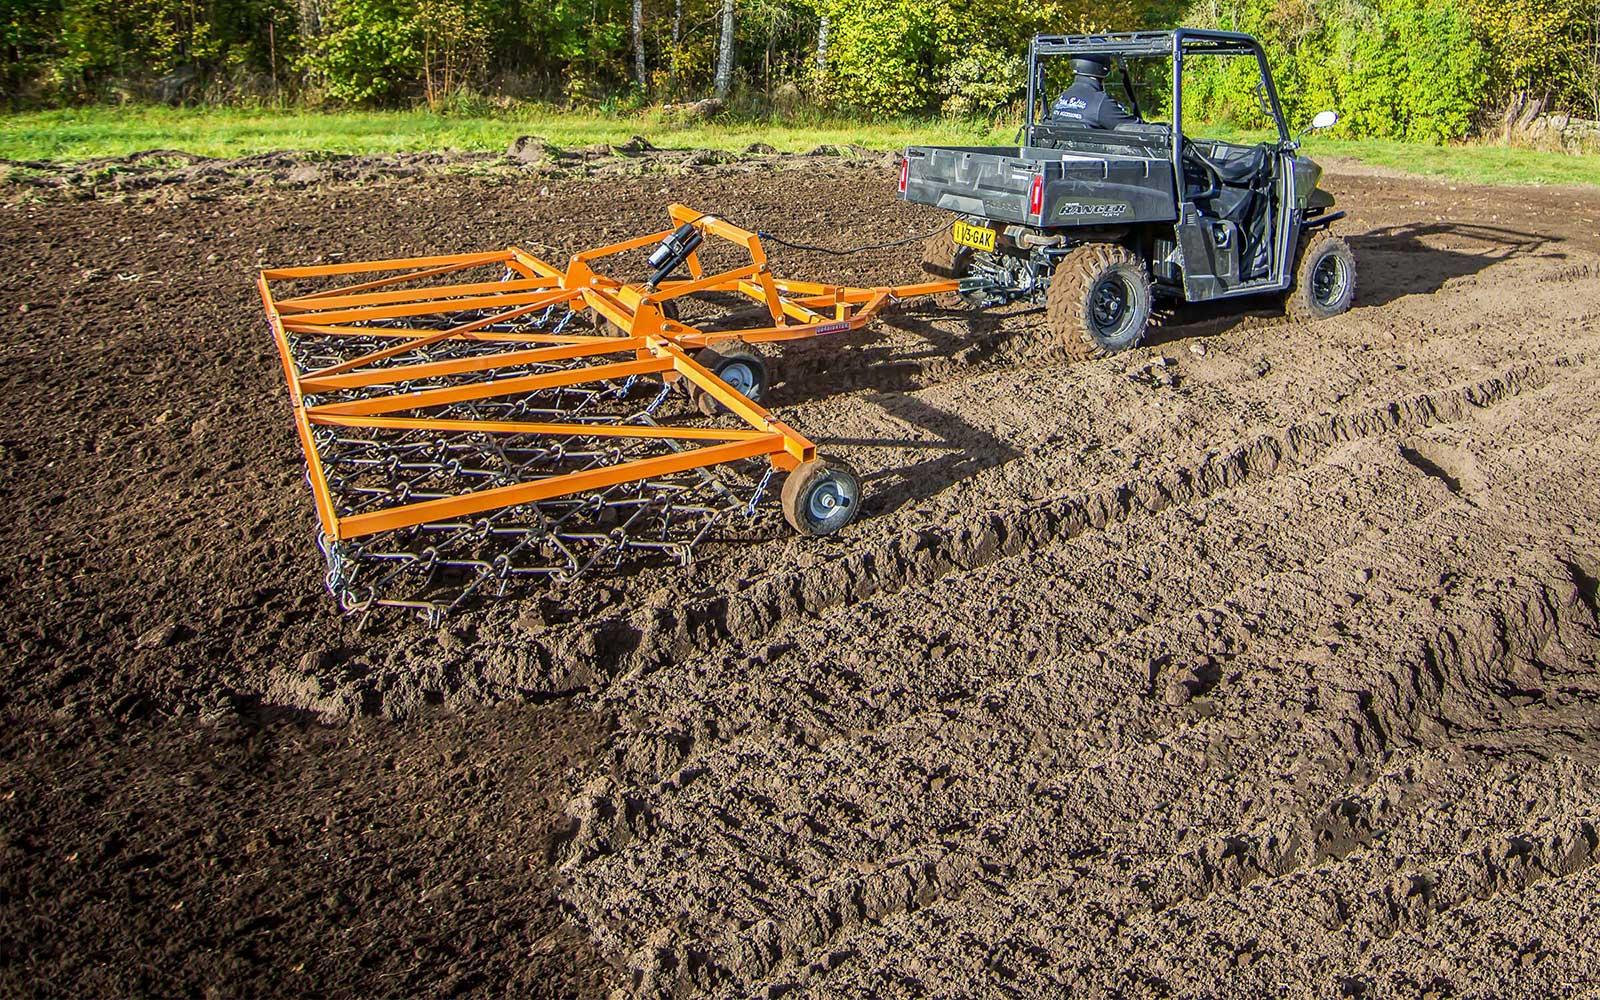 IronBaltic_ATV_UTV_agricultural_equipment_frontpage_slider